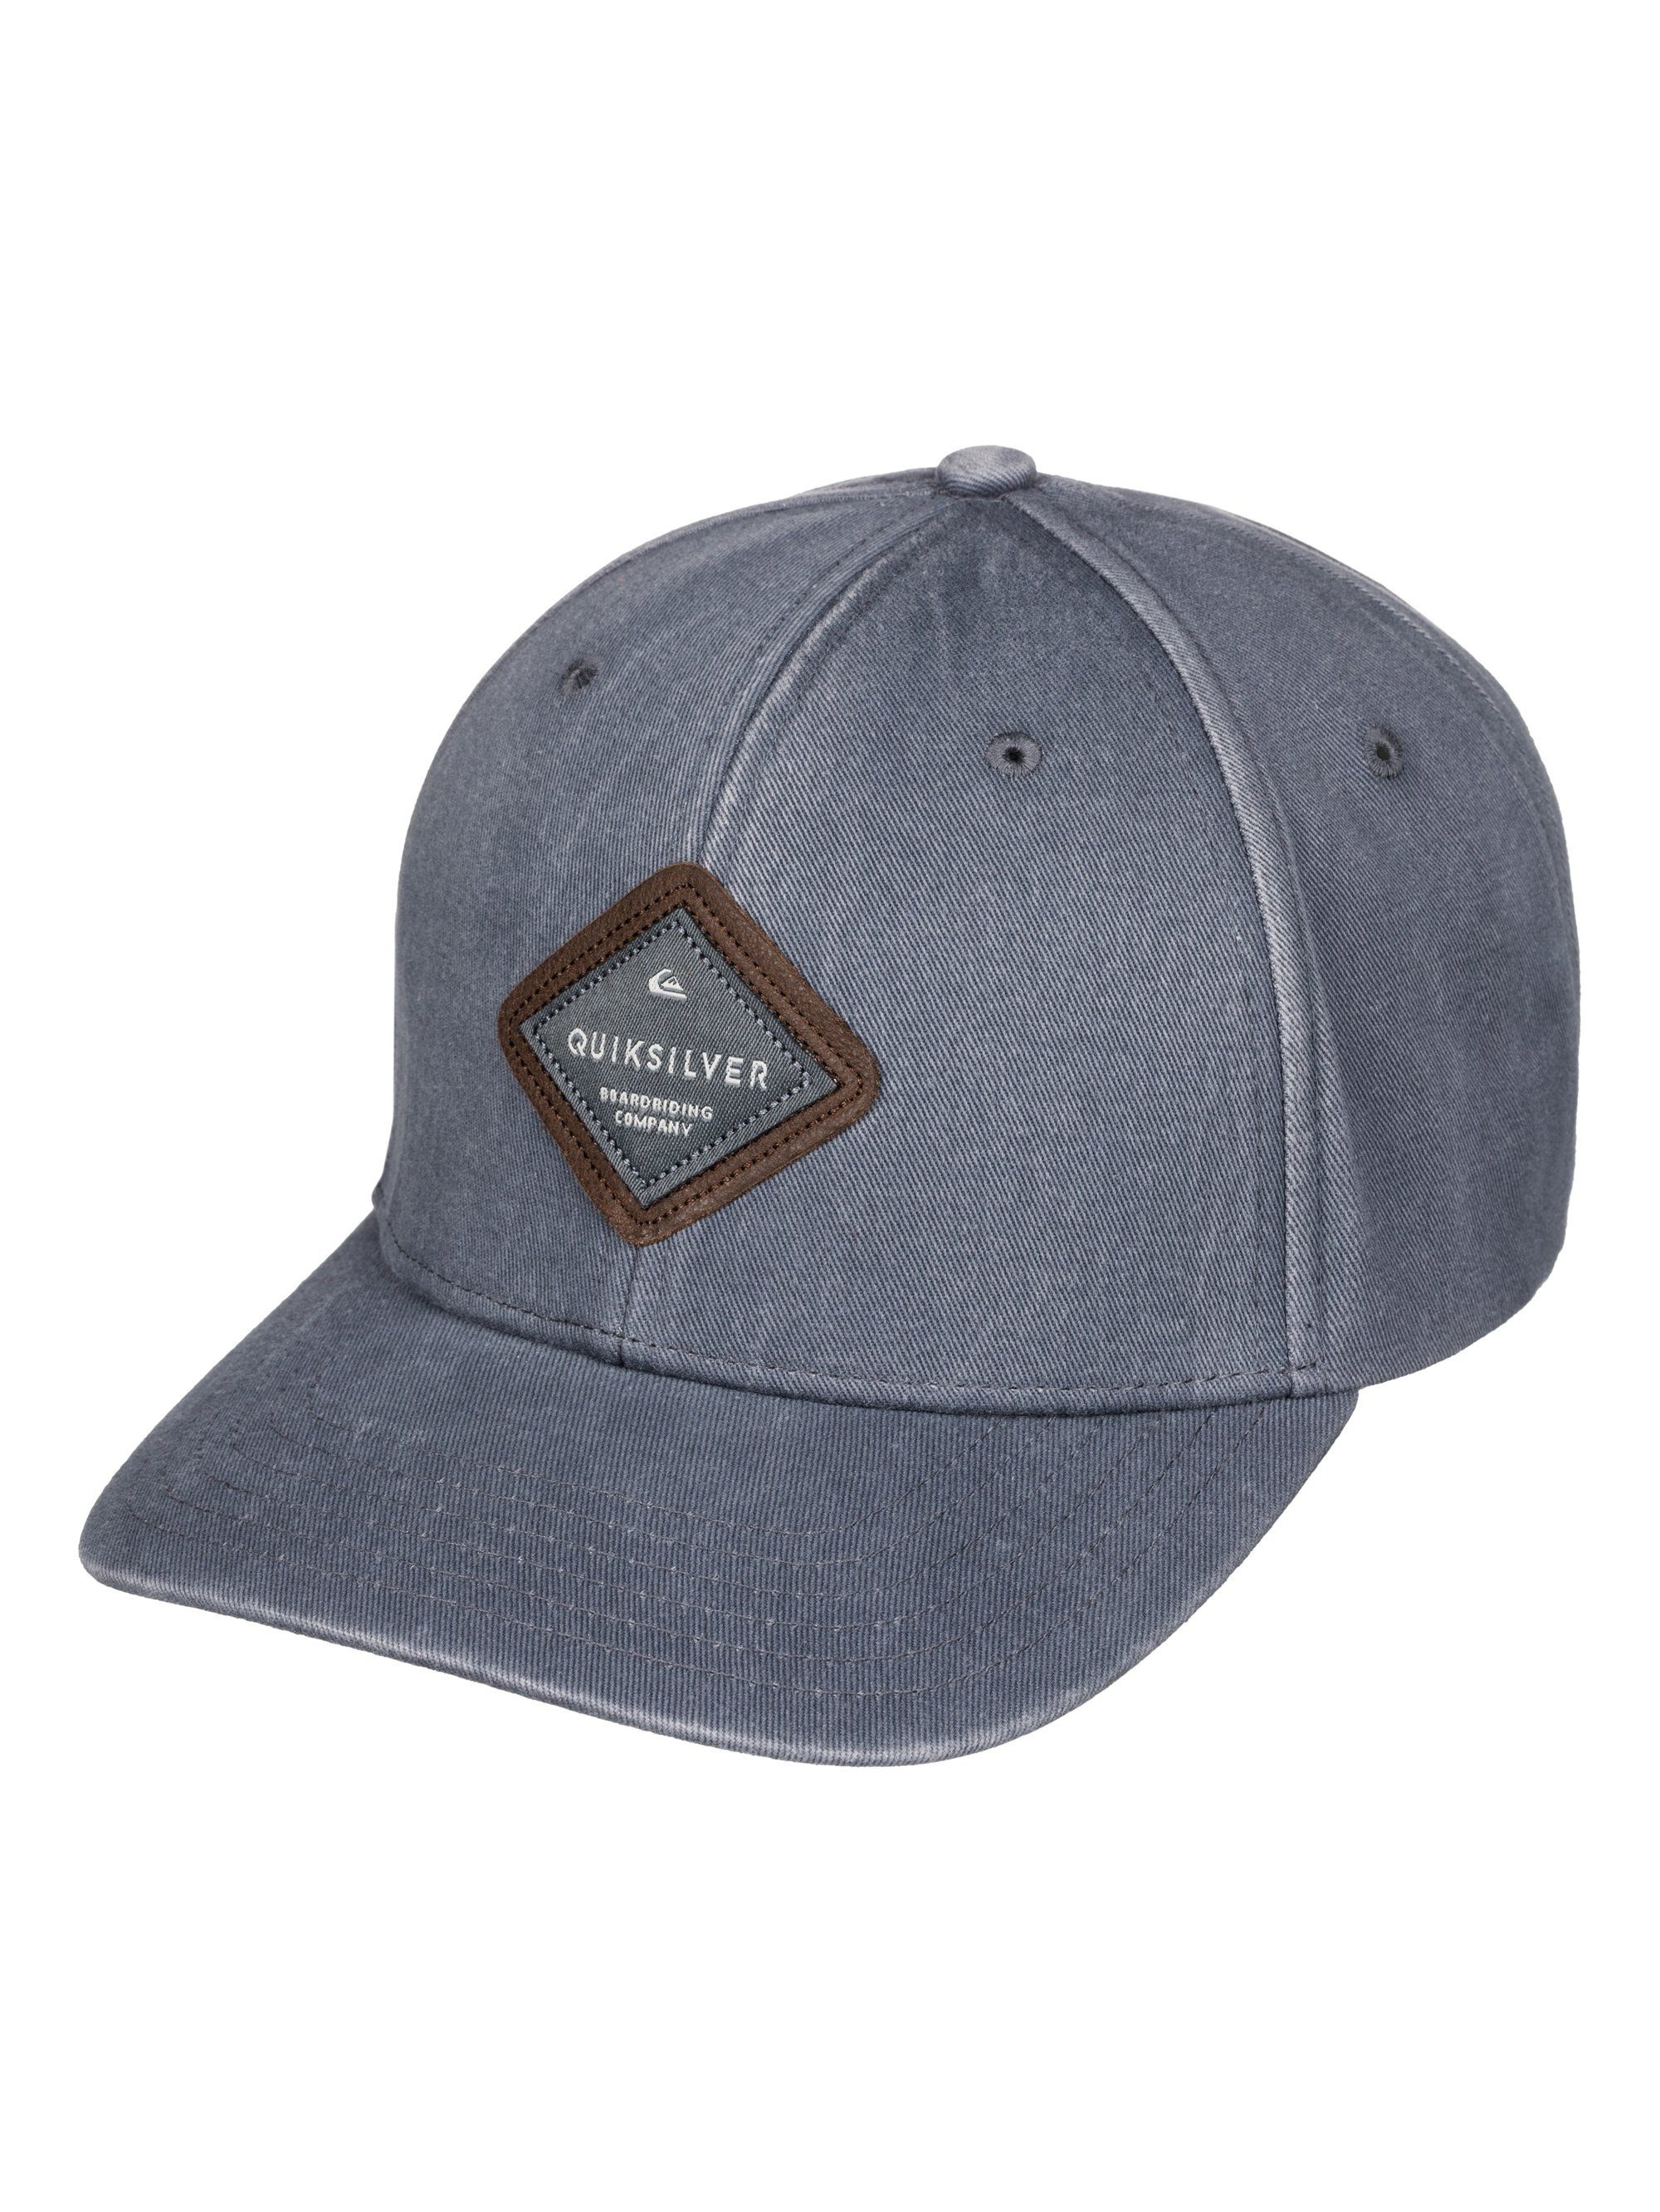 Quiksilver Snapback Cap »Lasting«